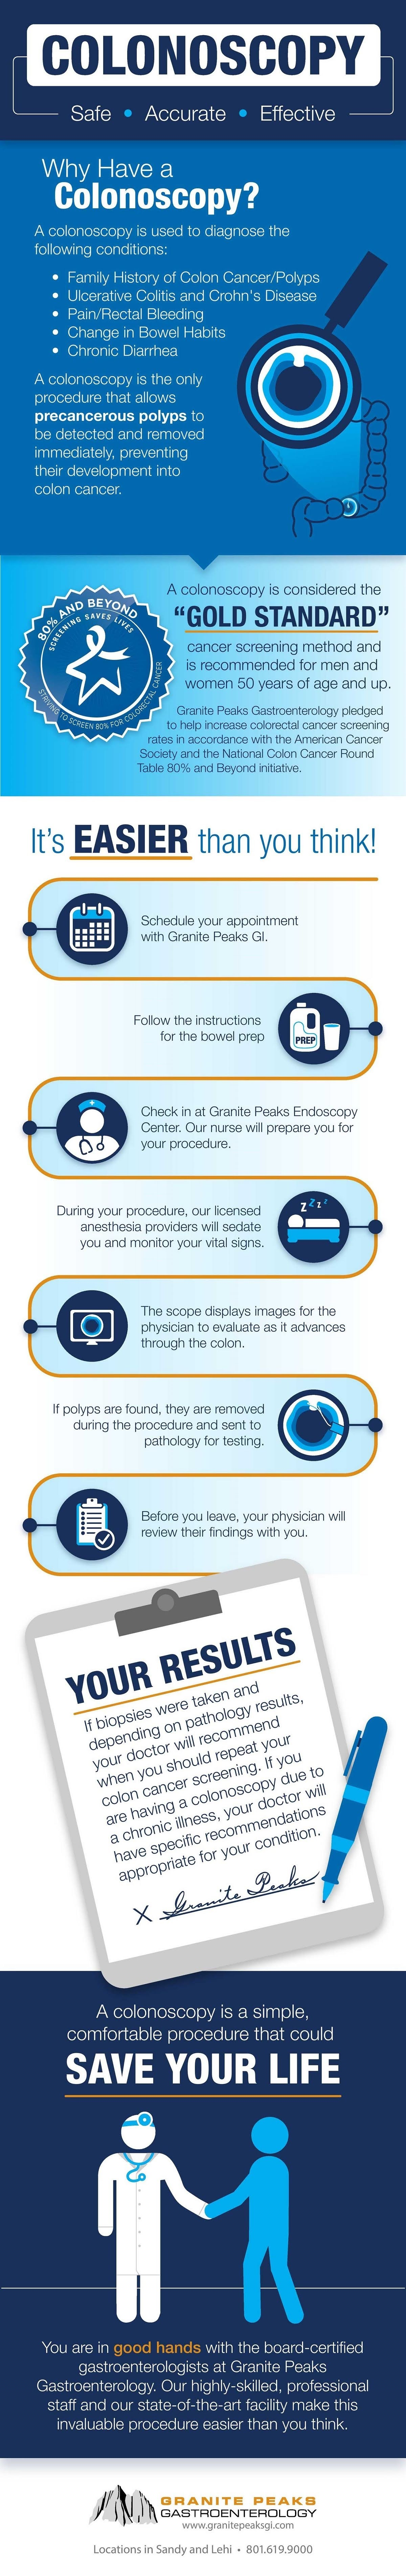 Colonoscopy Procedure Description #infographic